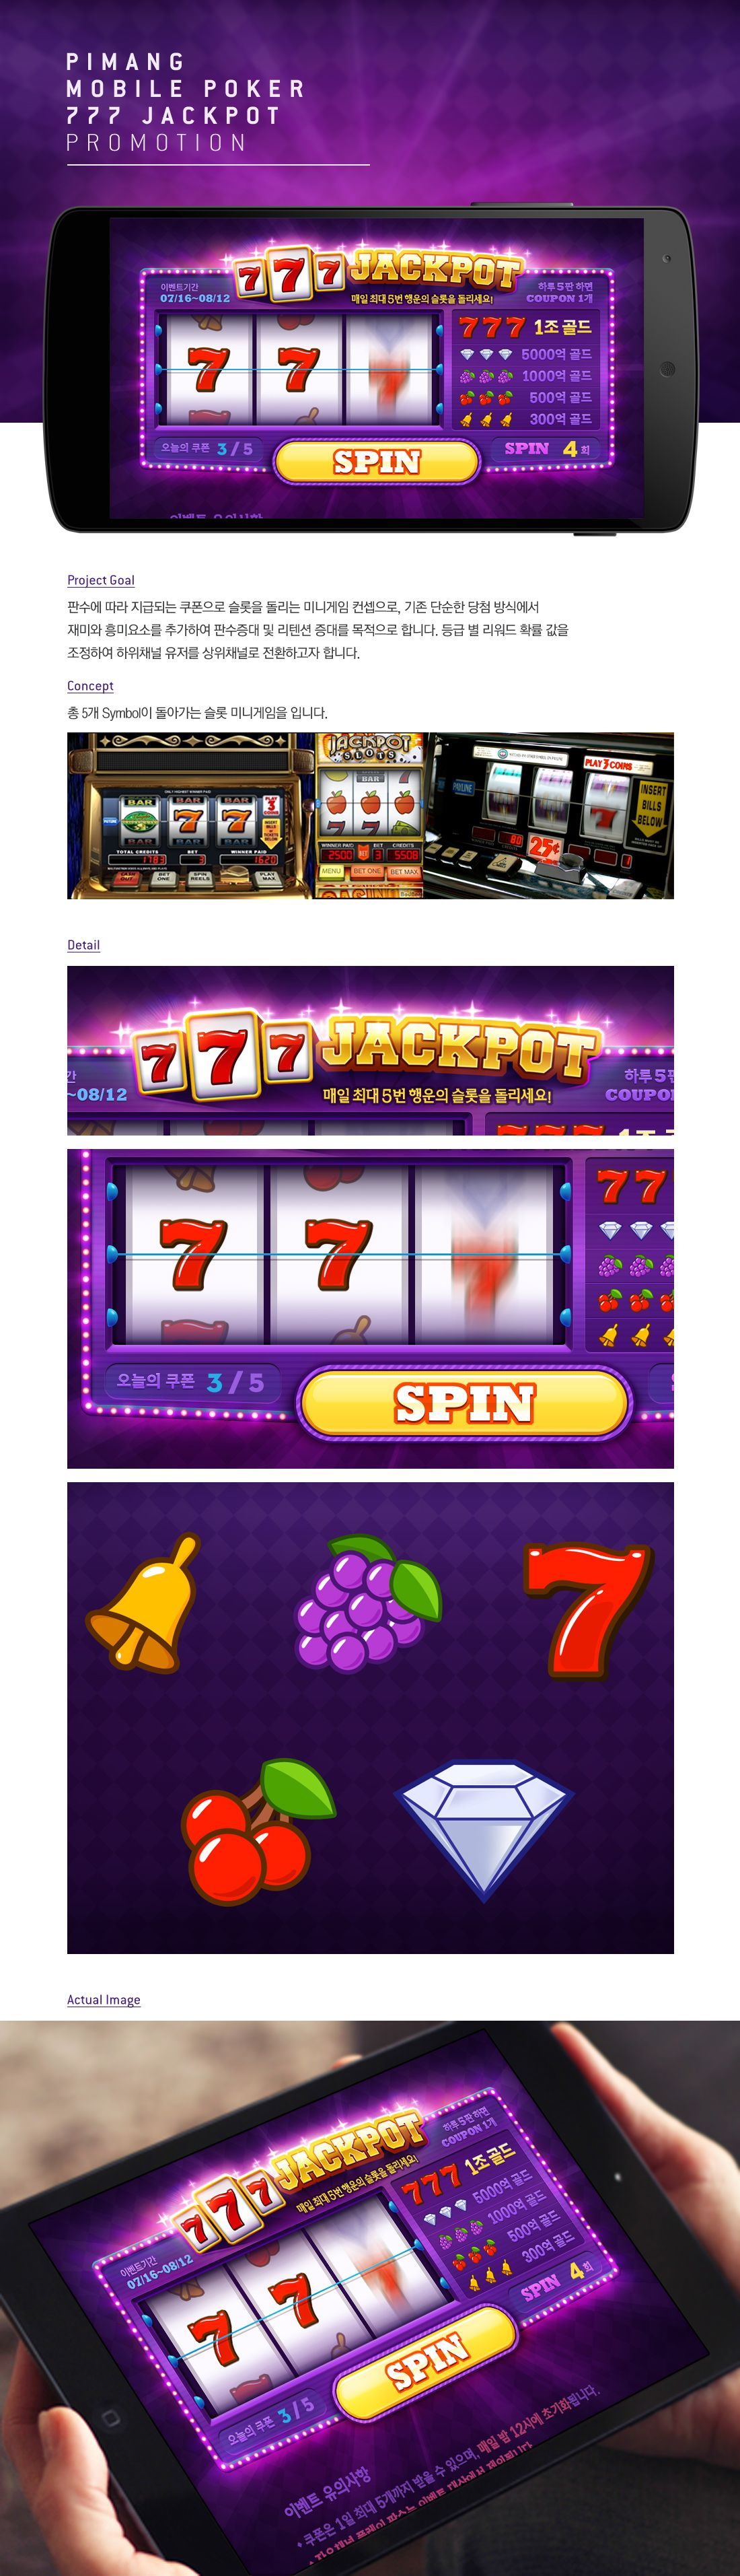 Poker 777 Jackpot slot Promotion on Behance Best casino